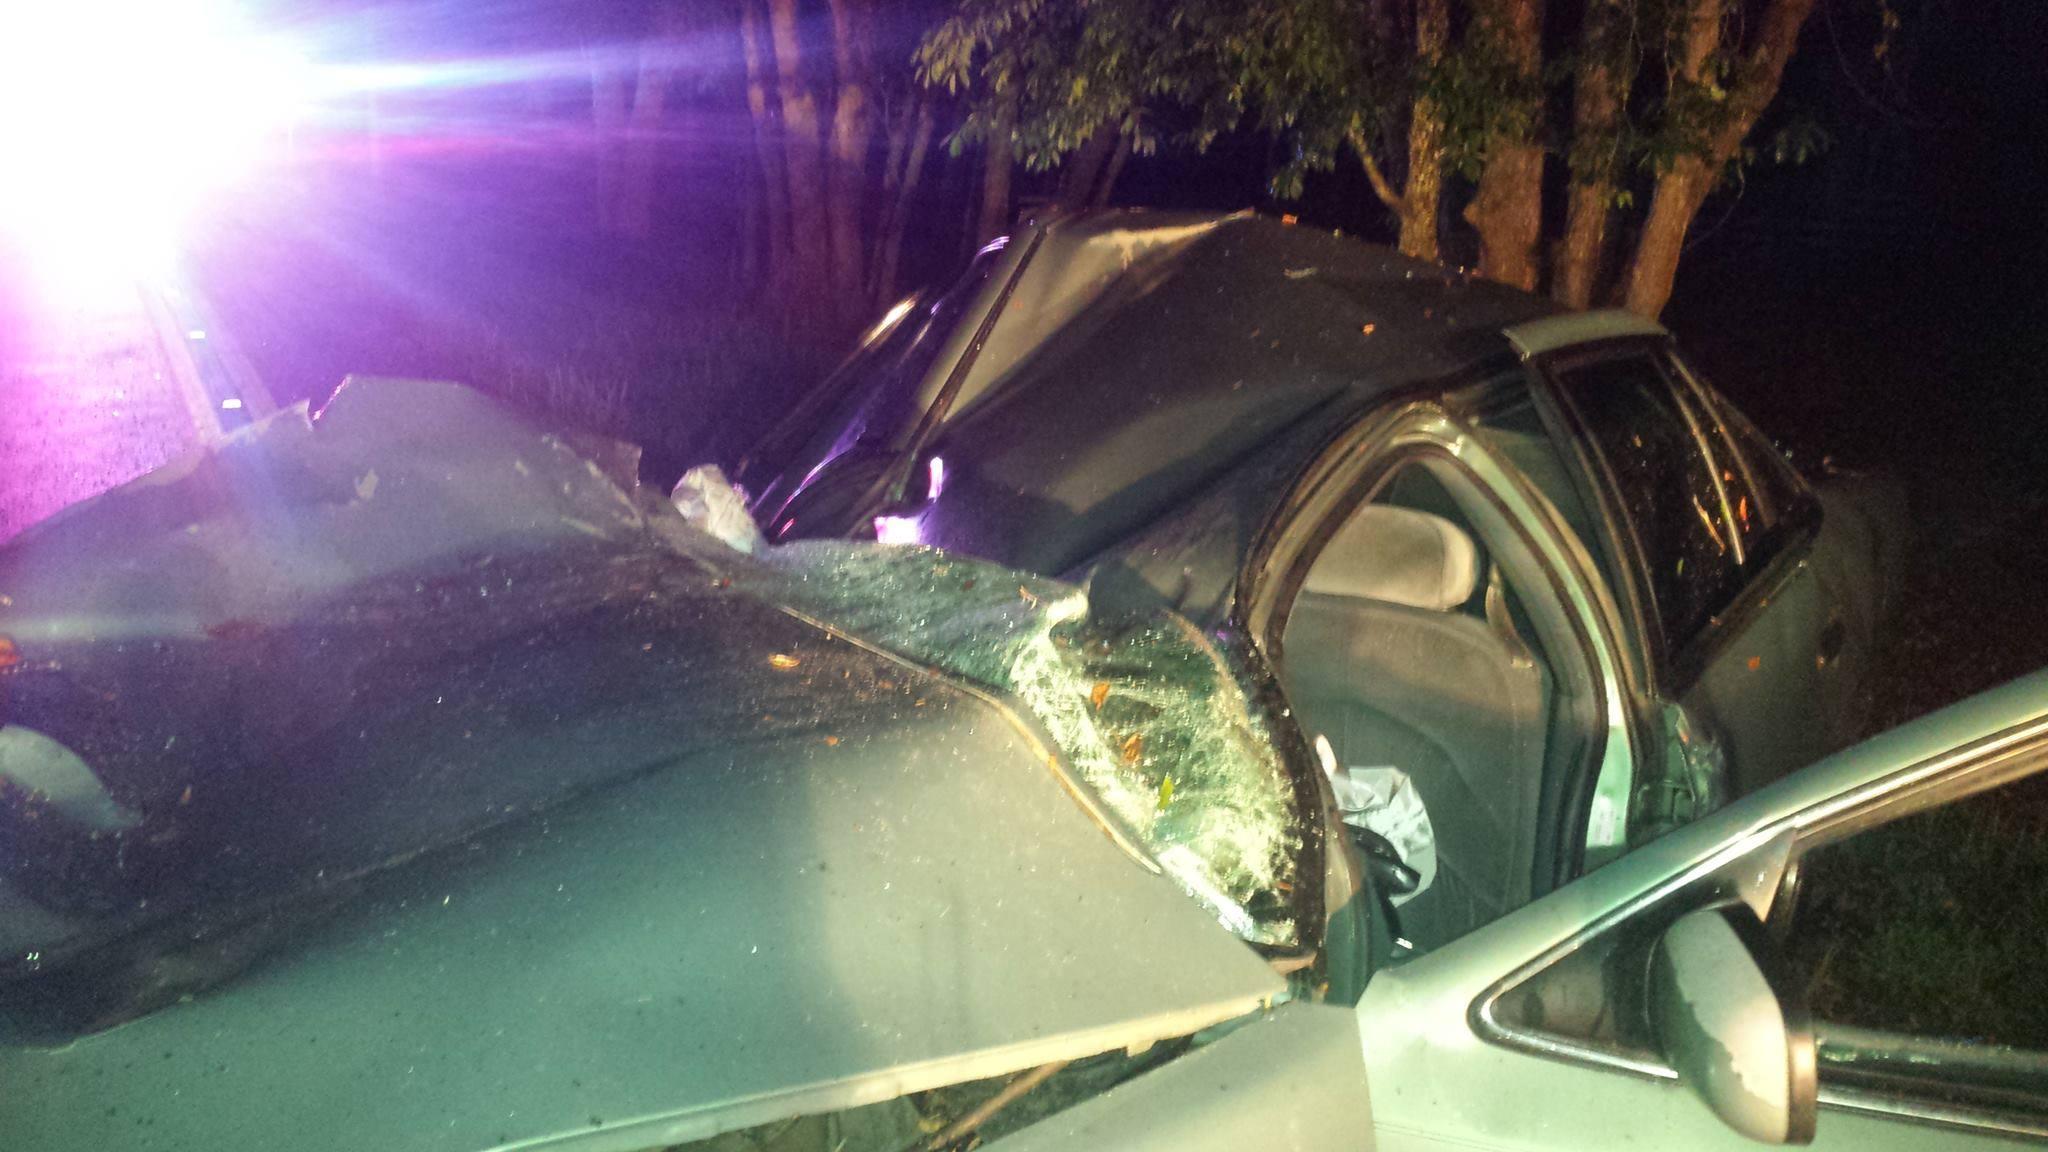 314a crash, ocala news, marion county news, car crash, car accident,